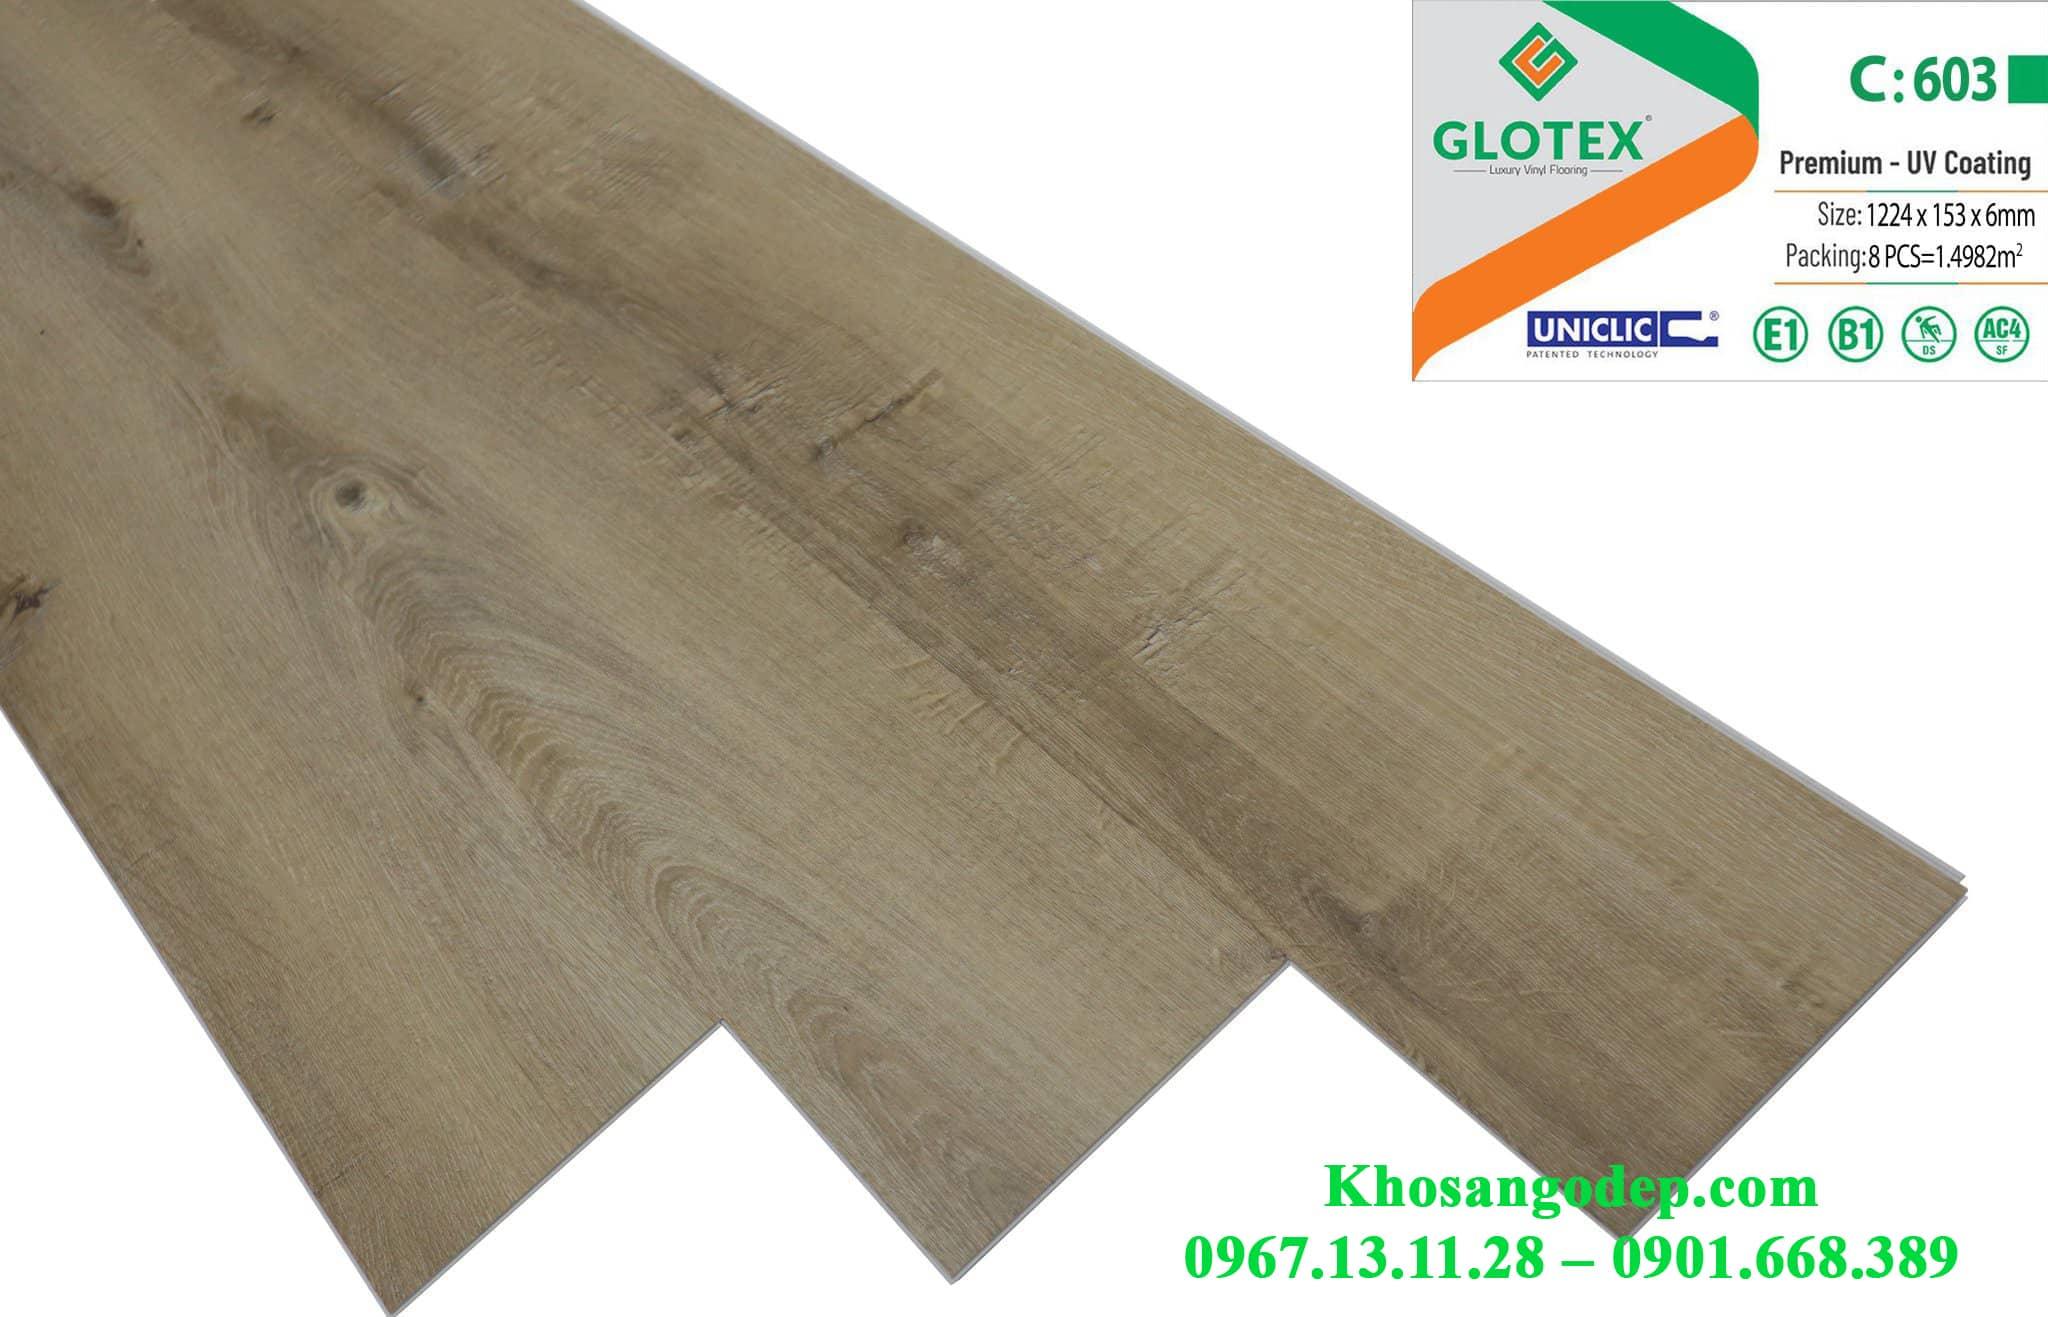 Sàn nhựa Glotex 6mm C603